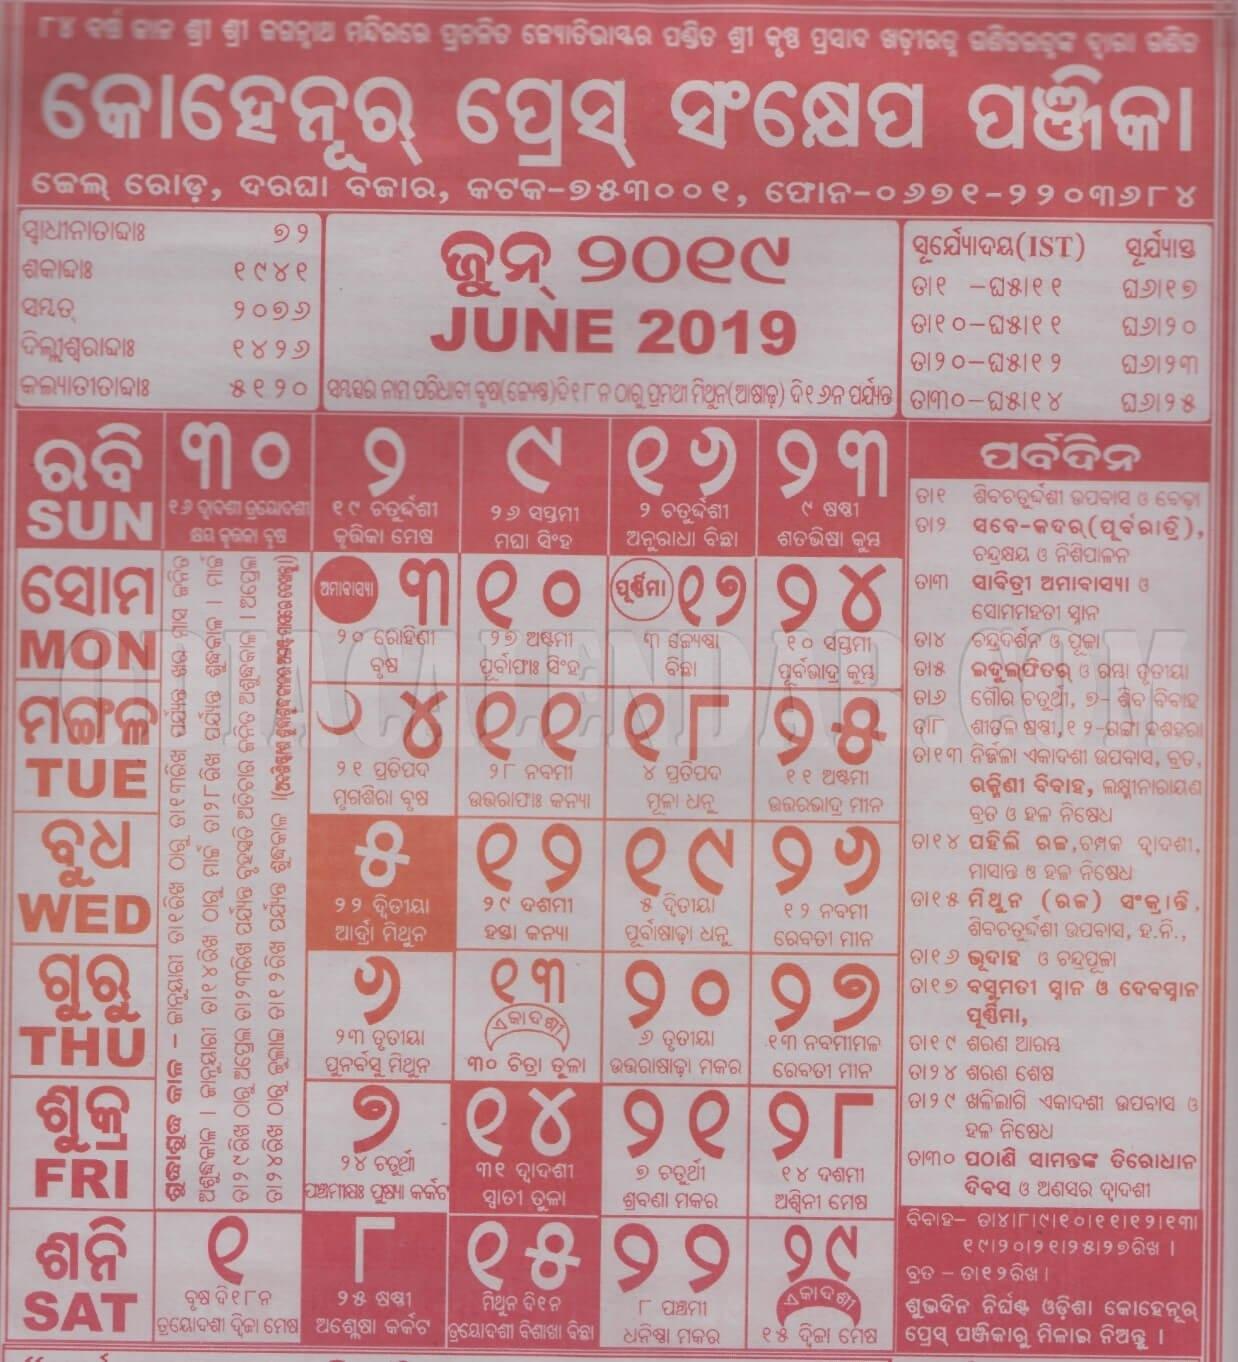 Odia Kohinoor Calendar 2019 June View And Download Free Calendar 2019 Kohinoor